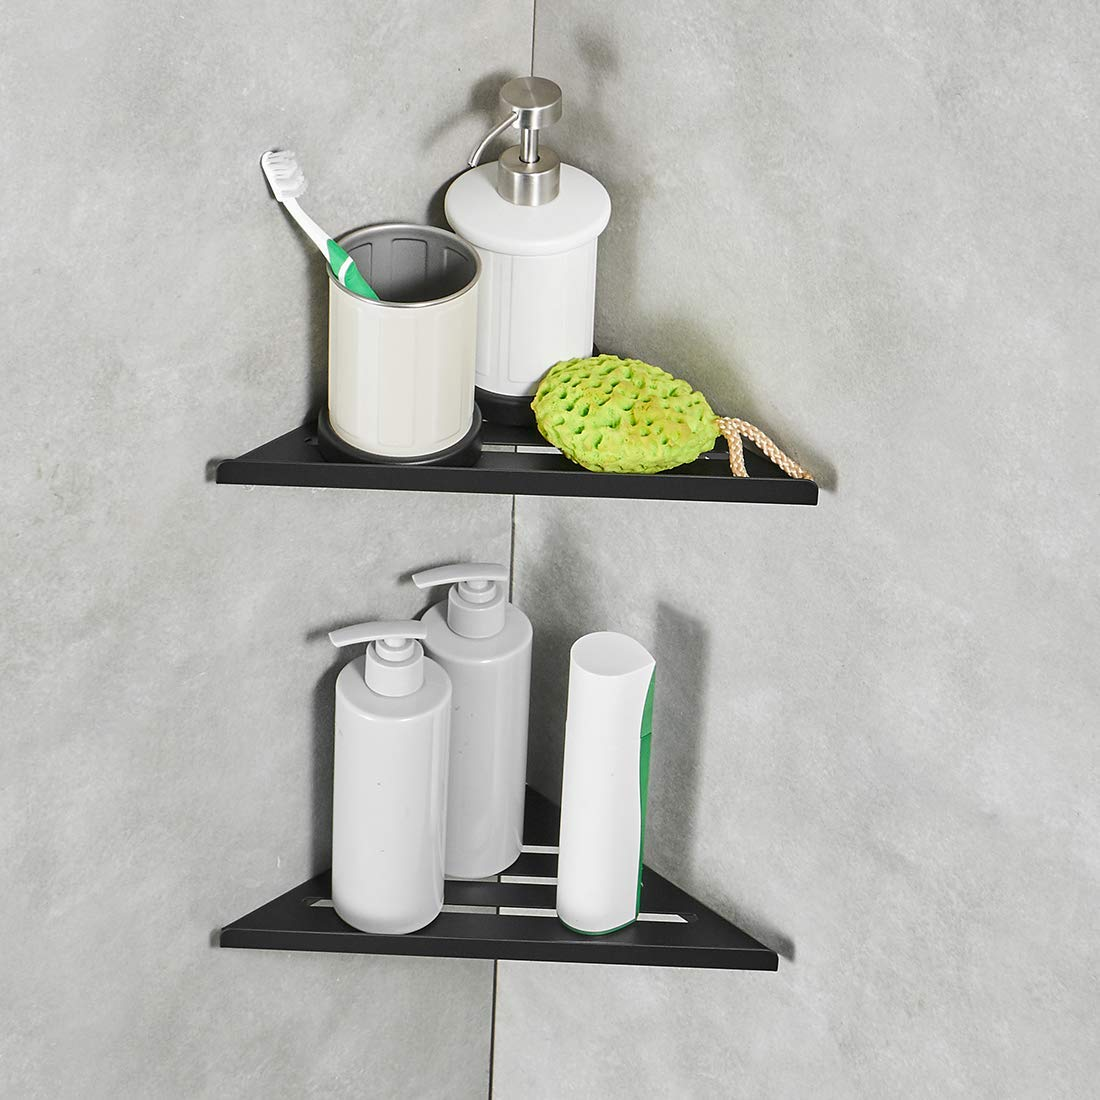 Shower corner caddy shower shelf bathroom shelf shower - Bathroom corner caddy stainless steel ...